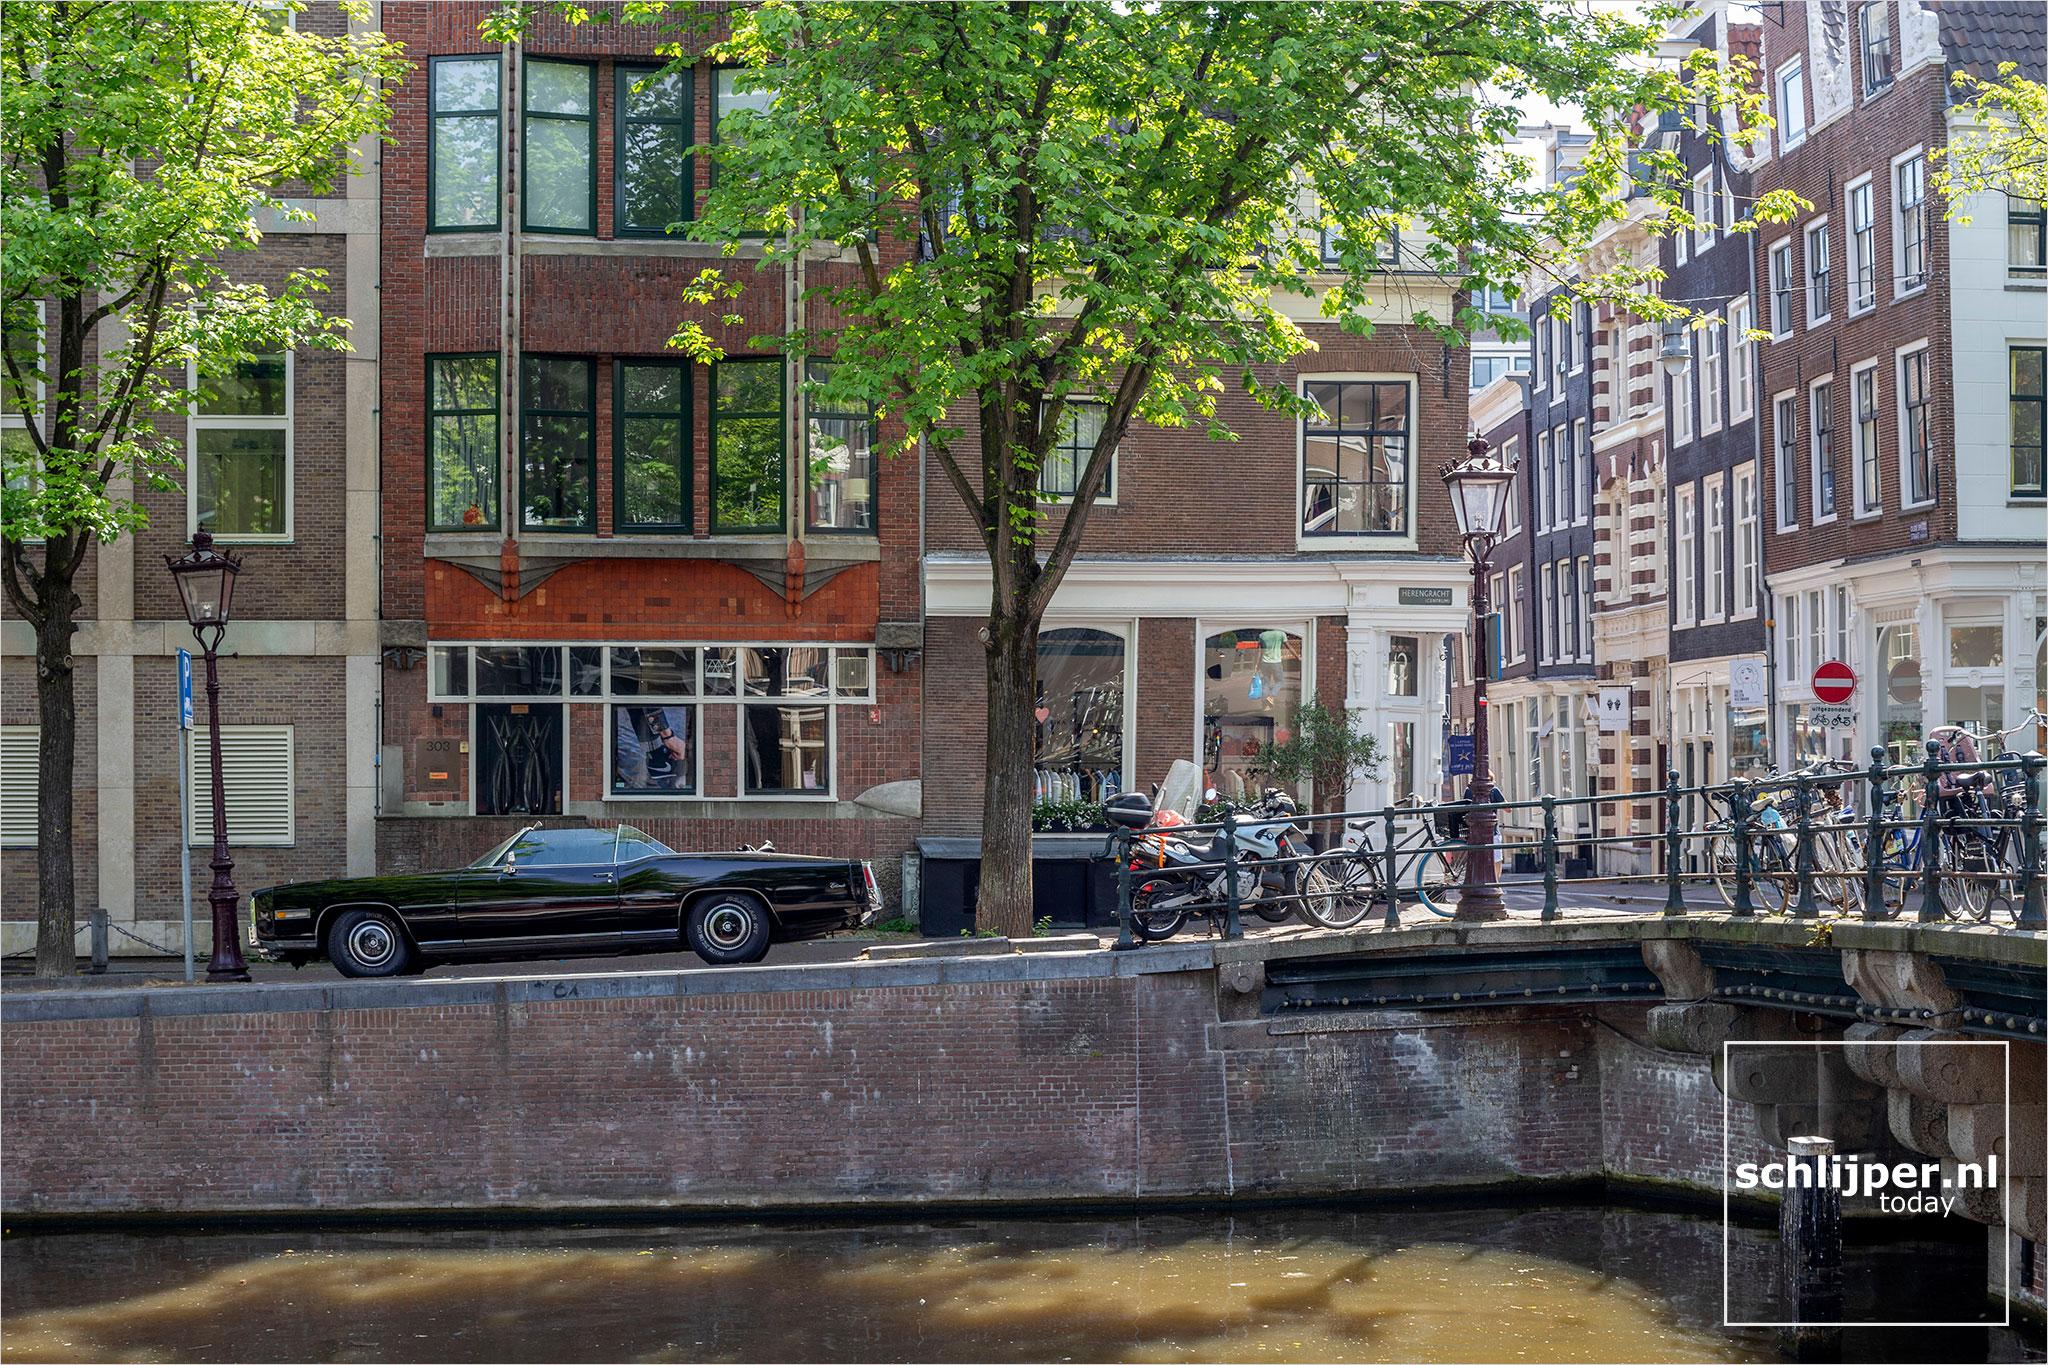 Nederland, Amsterdam, 2 juni 2020